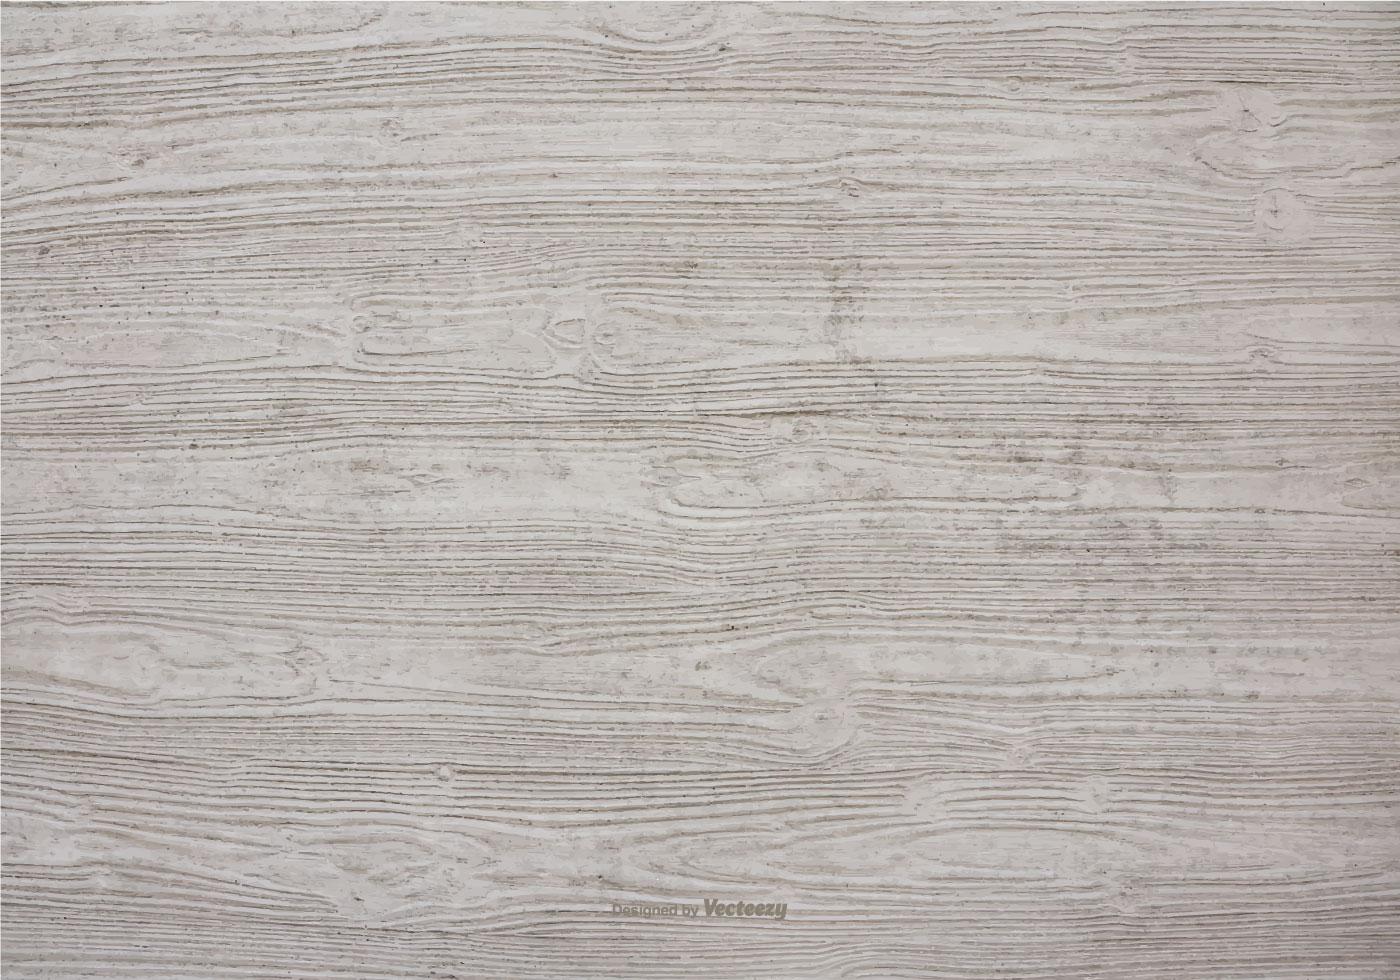 Wooden Vector Texture Download Free Vectors Clipart